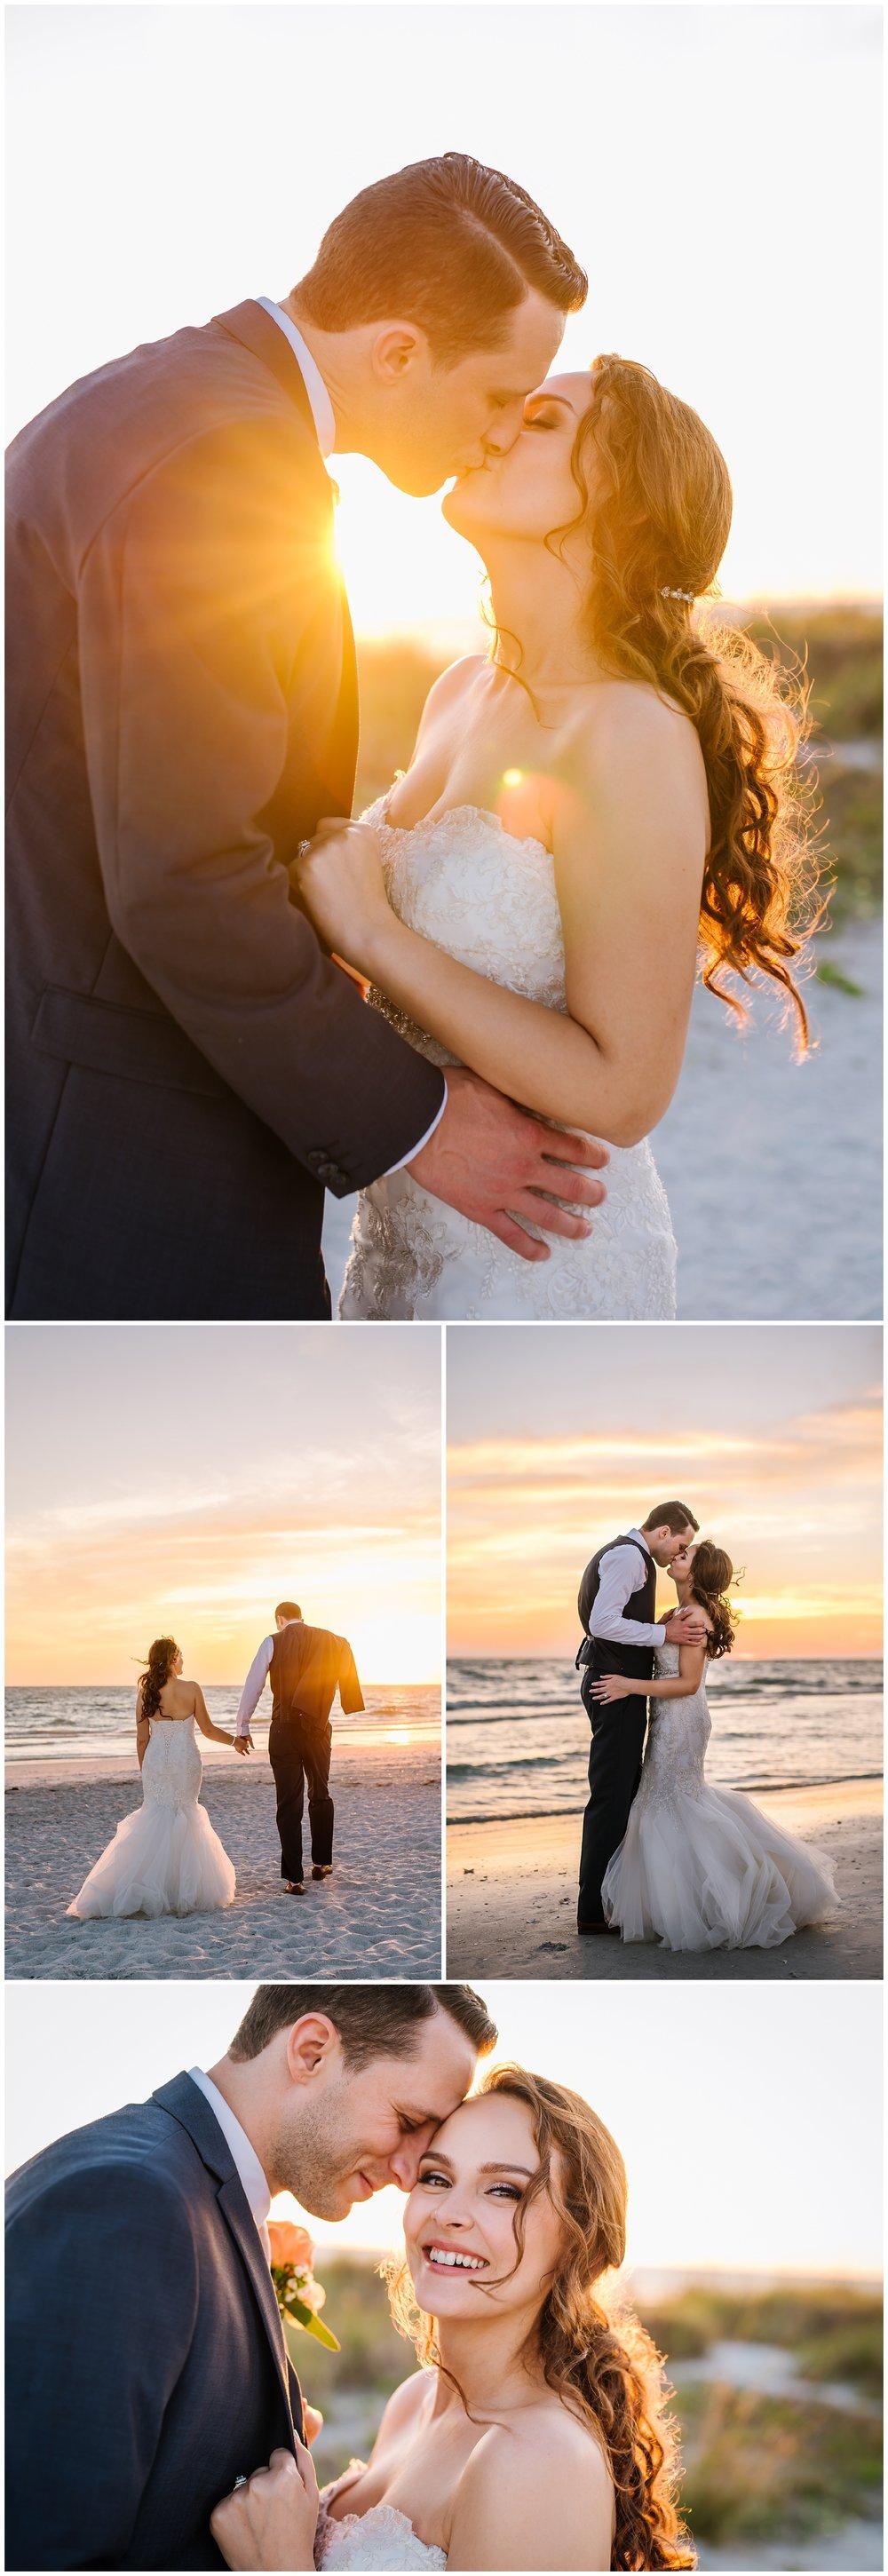 Ashlee-hamon-photography-year-in-review-2016-travel-wanderlust-vsco-adventure-wedding_0070.jpg